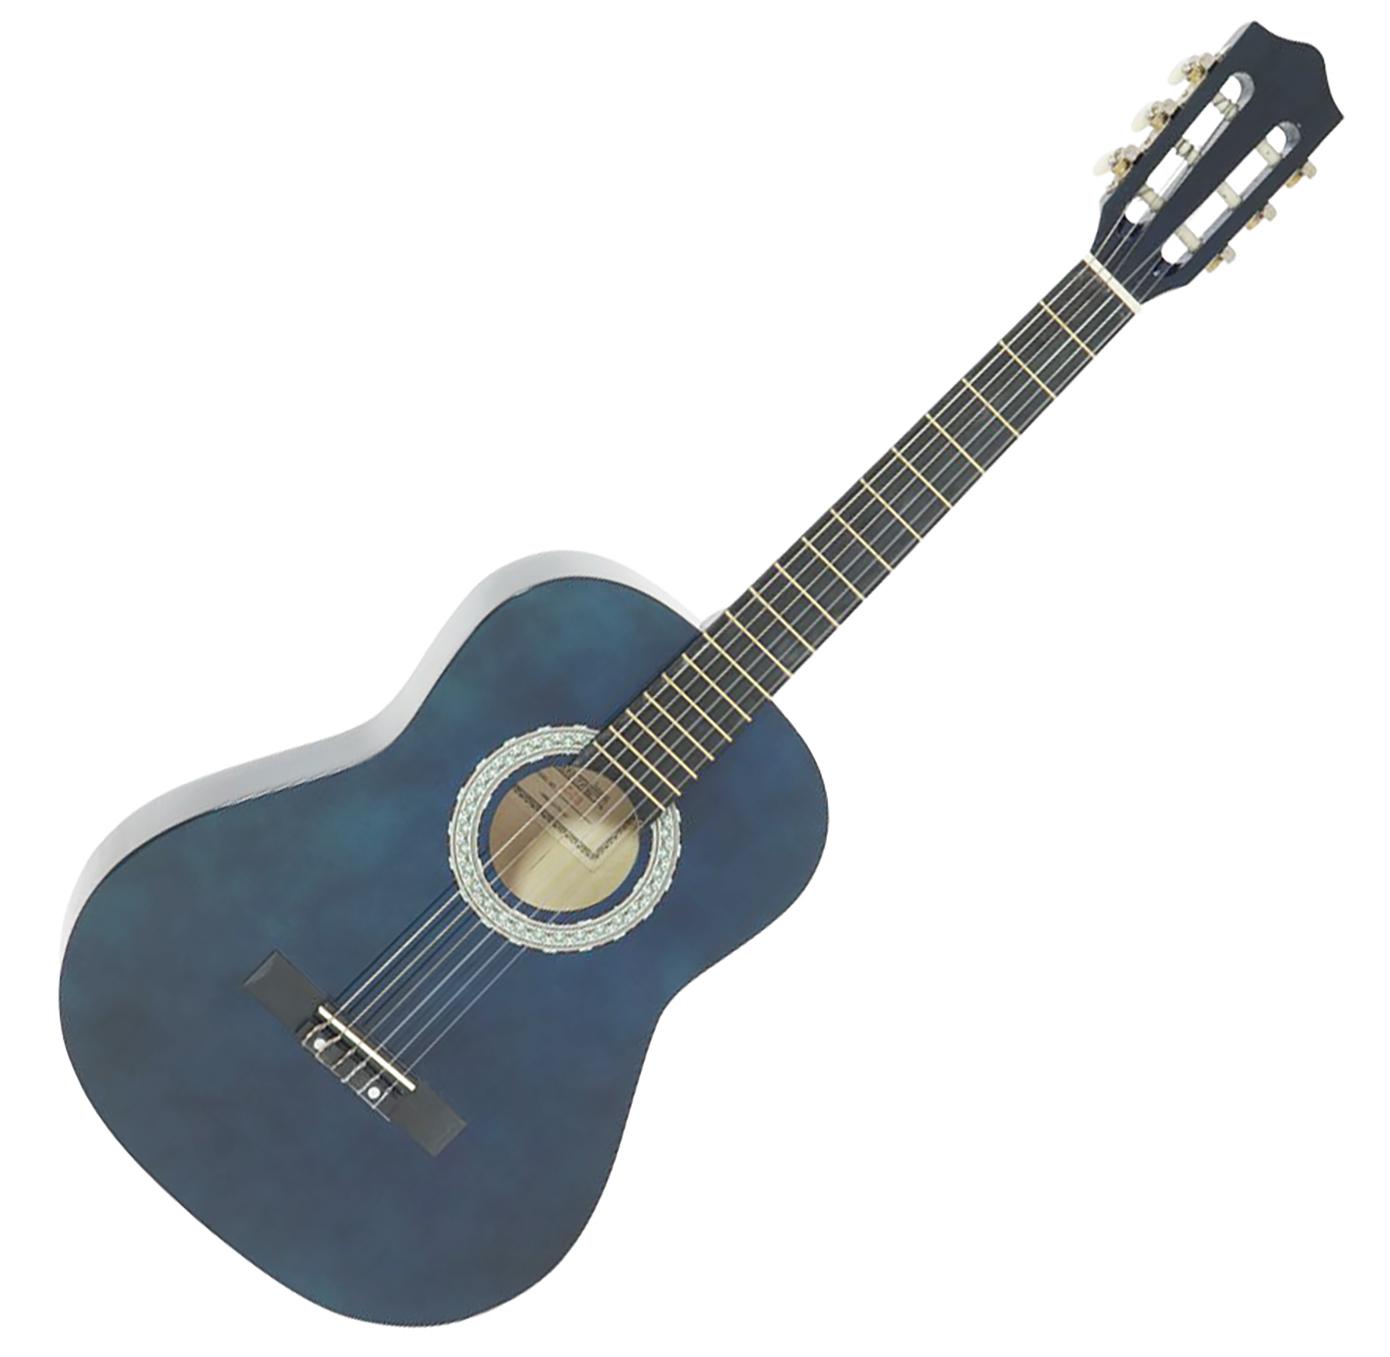 DiMavery AC-303 klassisk spansk guitar 3/4, blå